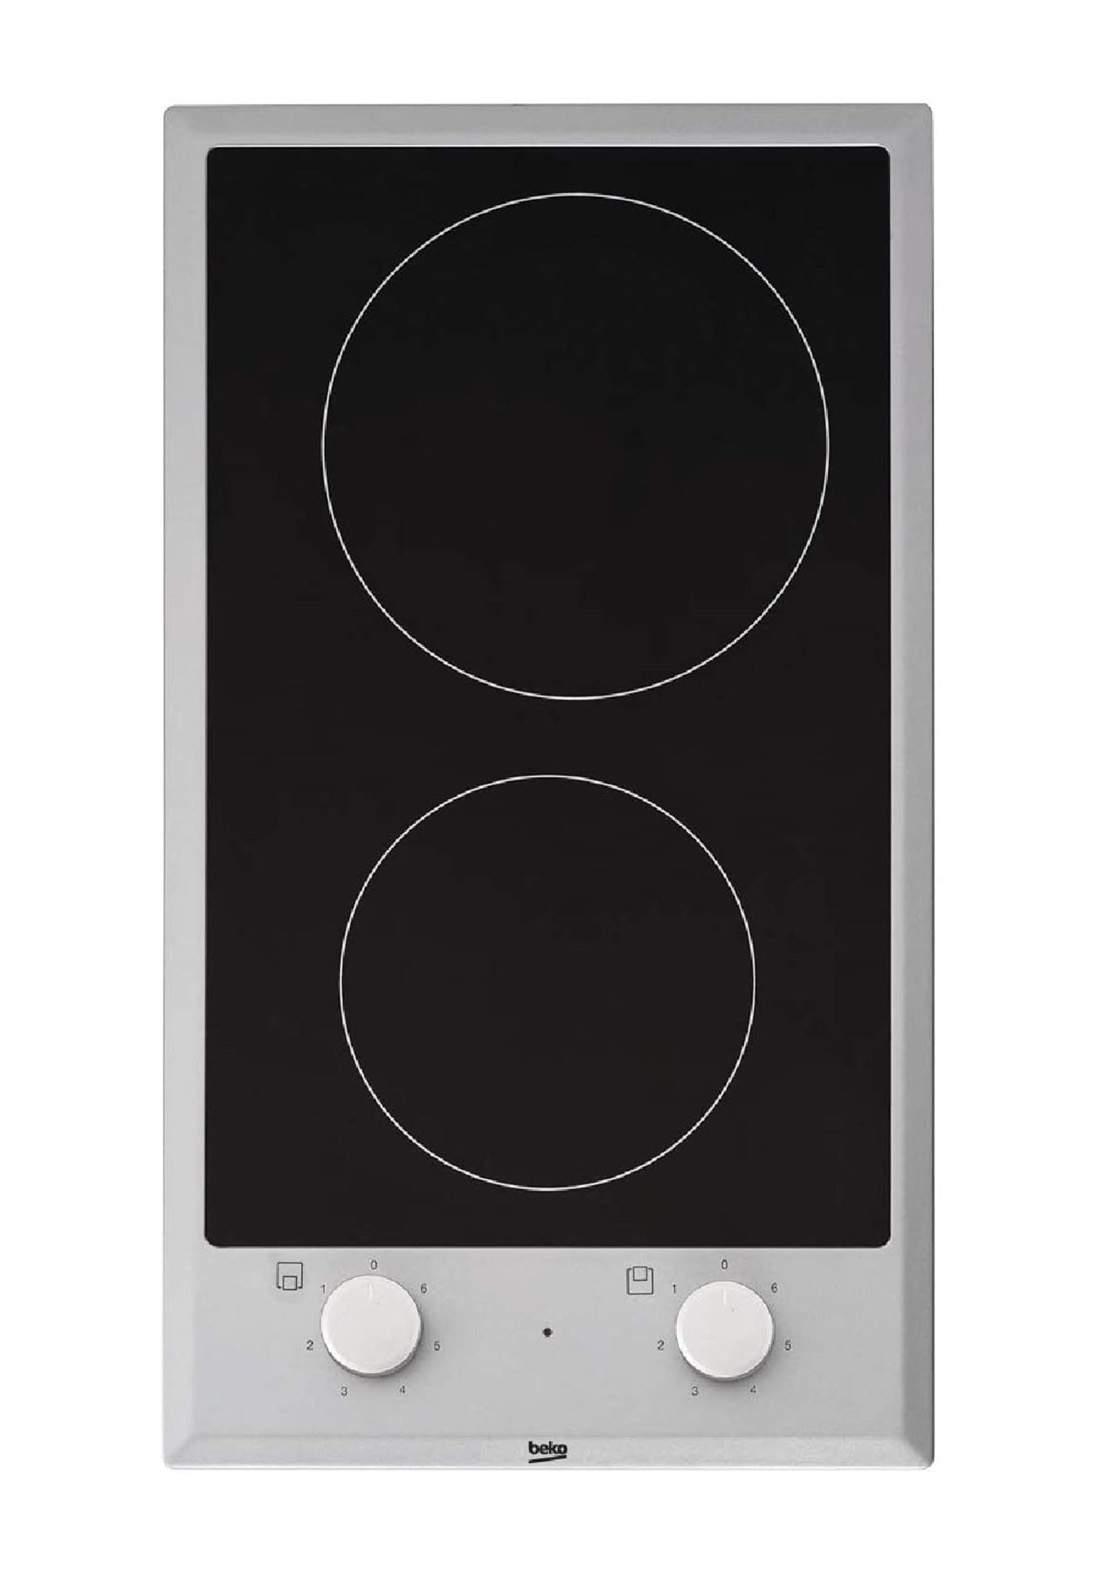 Beko HDCC 32200 X 30 cm Hob Glass Ceramic - Black طباخ